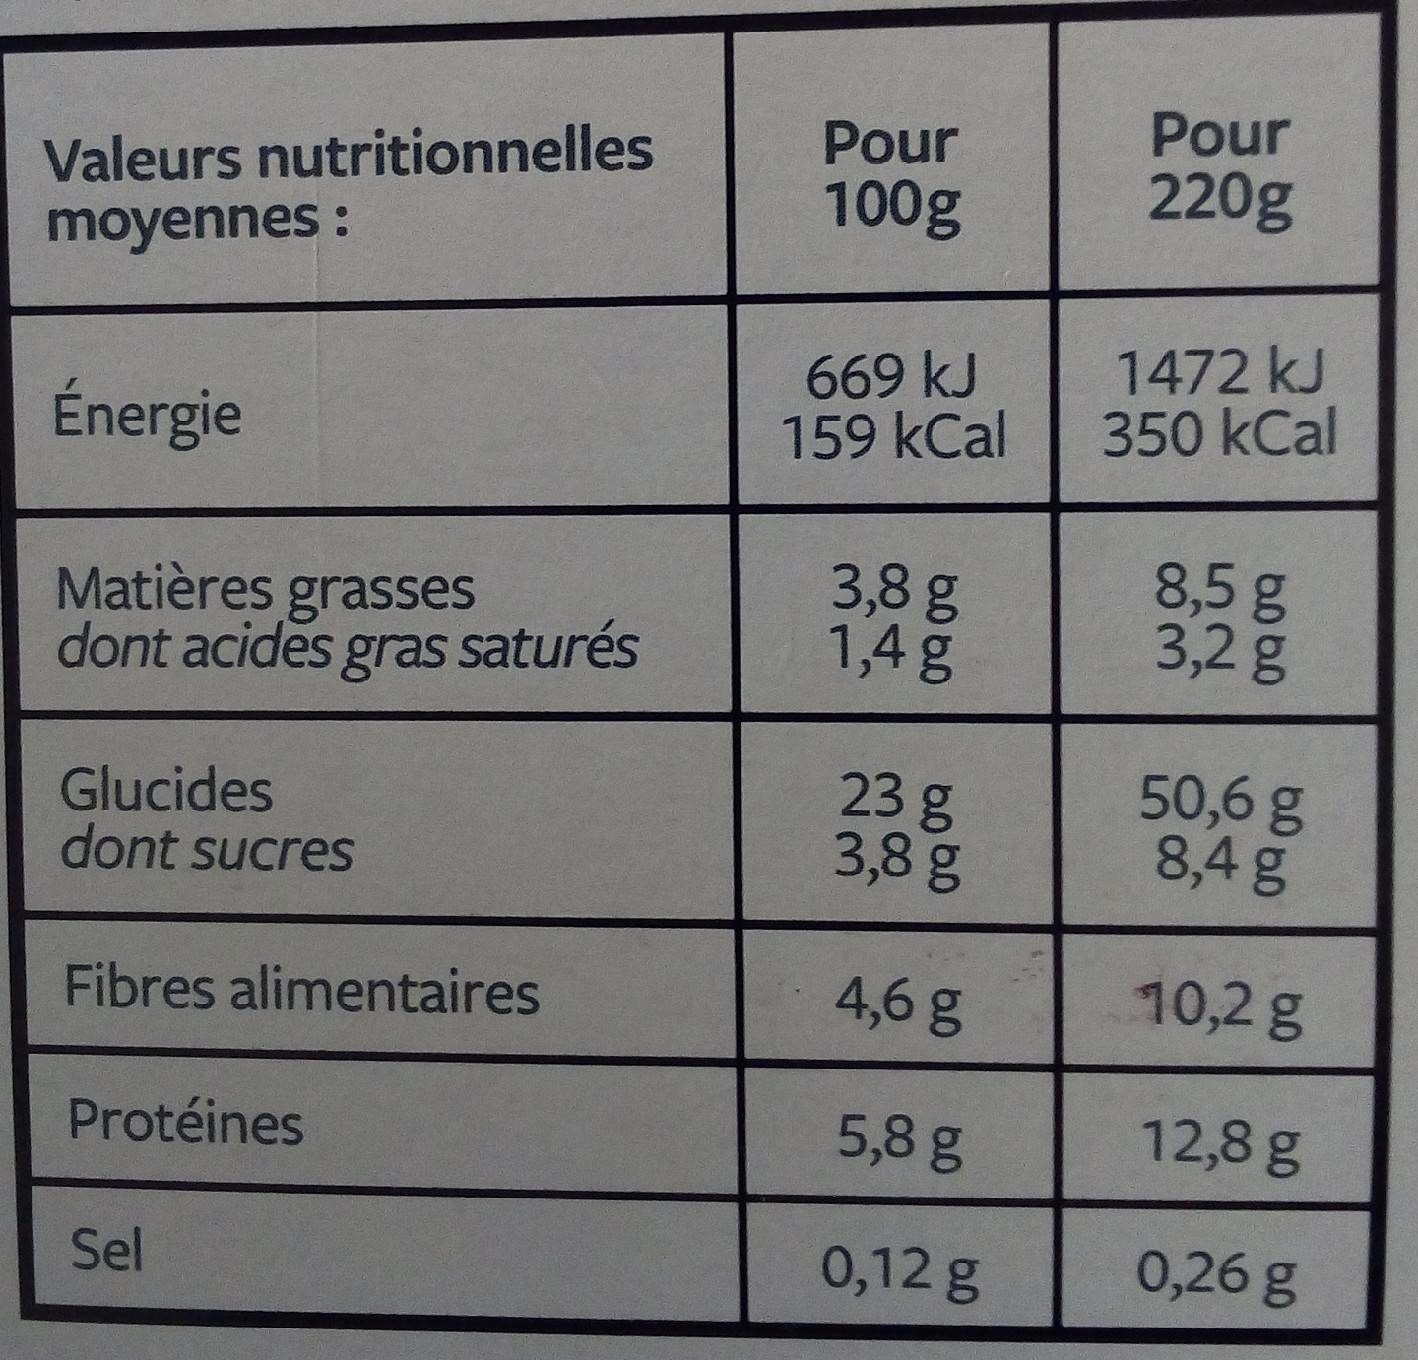 Poêlée Sarrasin pomme et algue Kombu royal - Voedingswaarden - fr